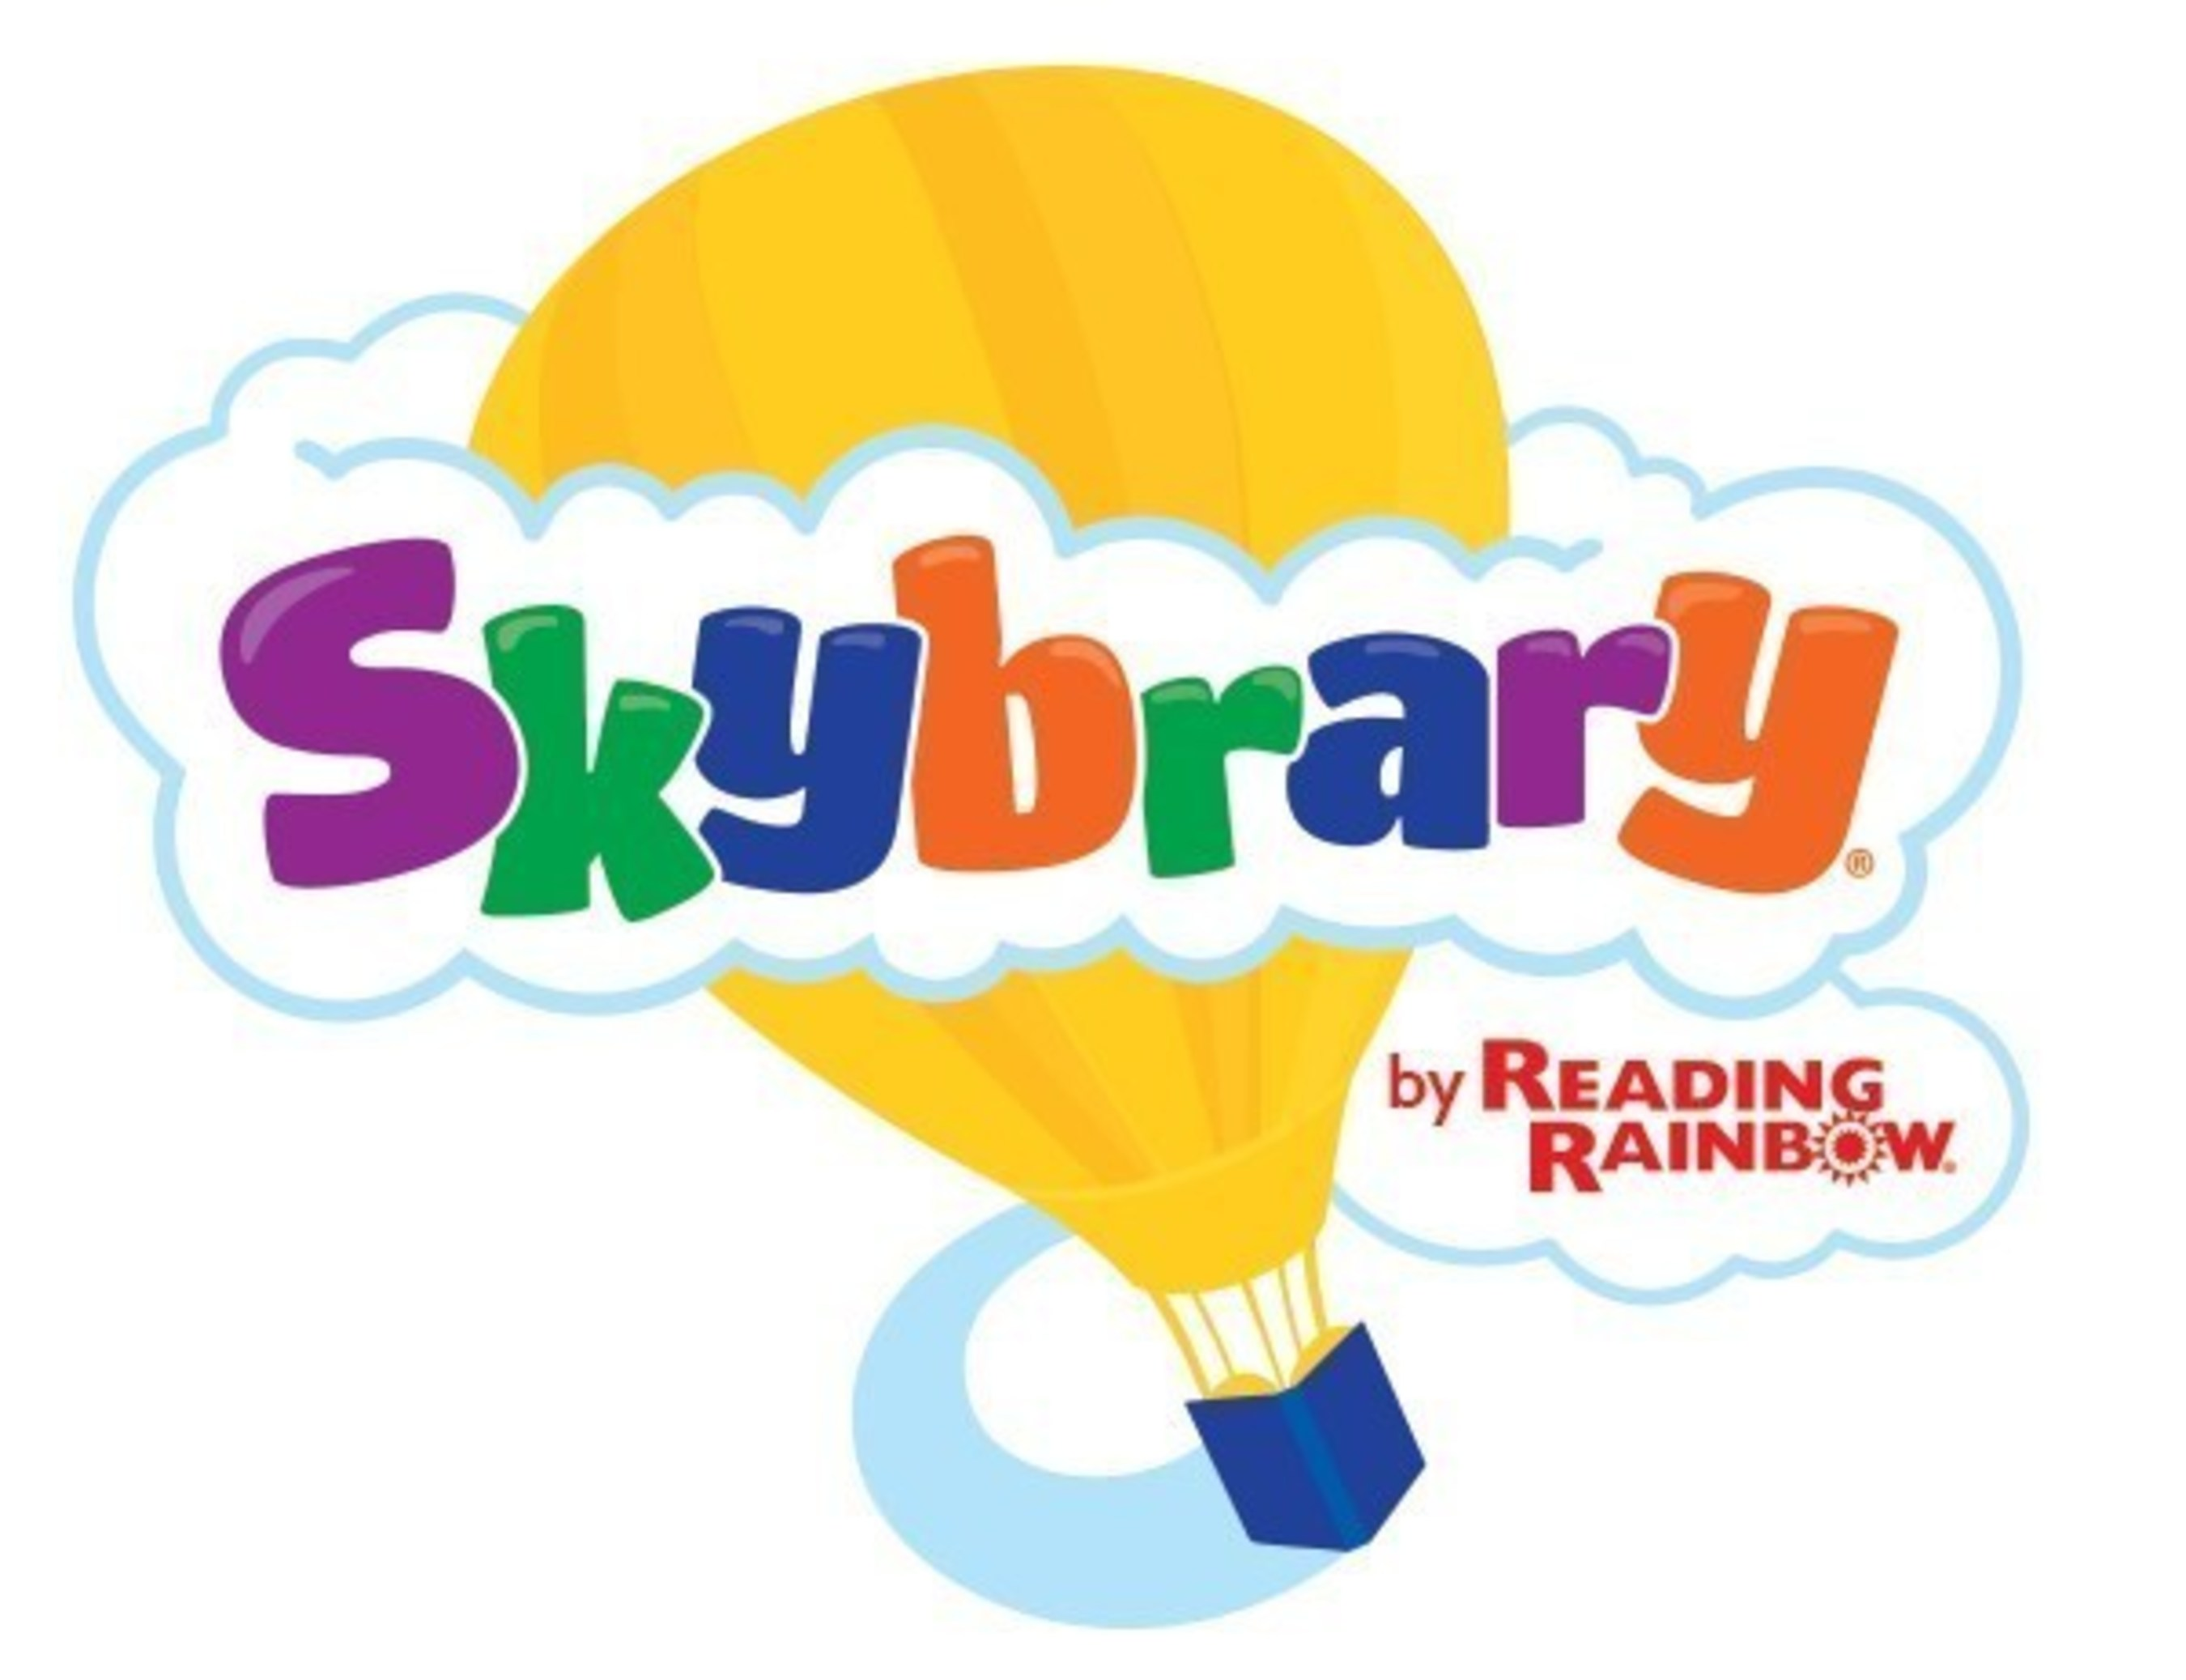 SKYBRARY Logo